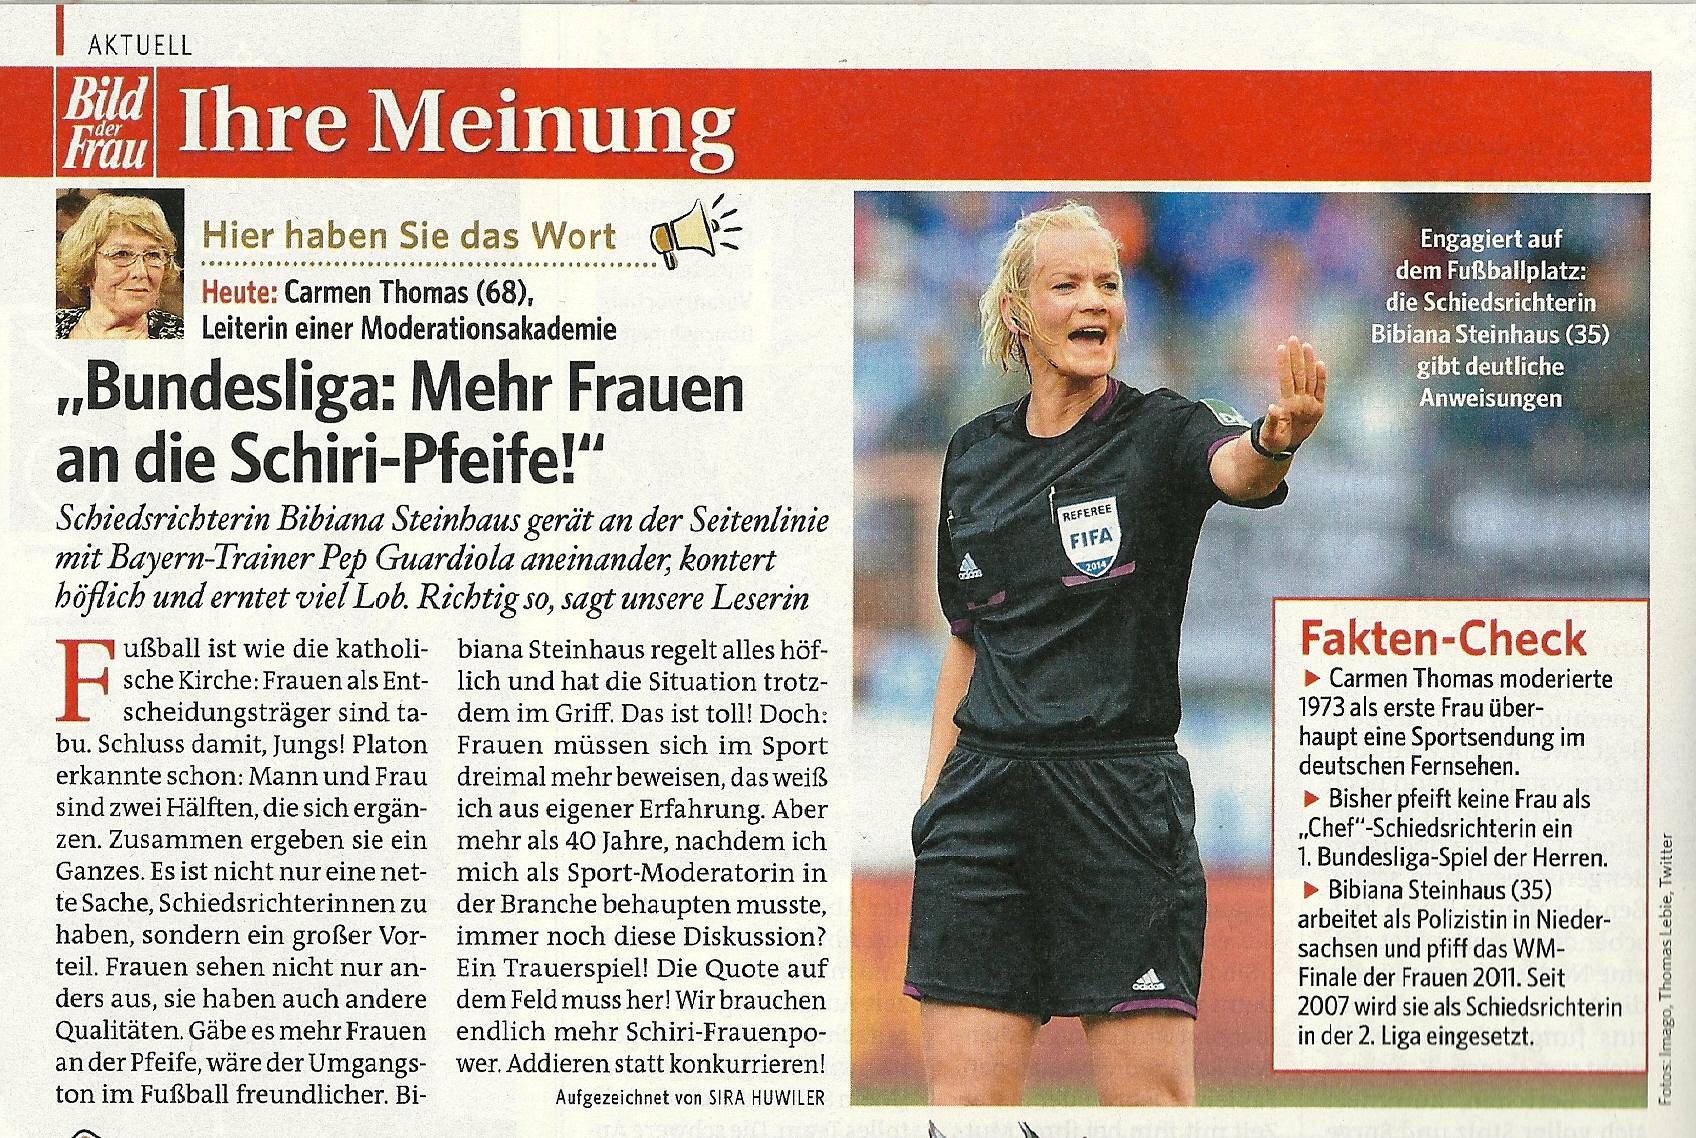 Art Bild der Frau - Frauen an die Schiri-Pfeife     Heft 46 - 07.11.14